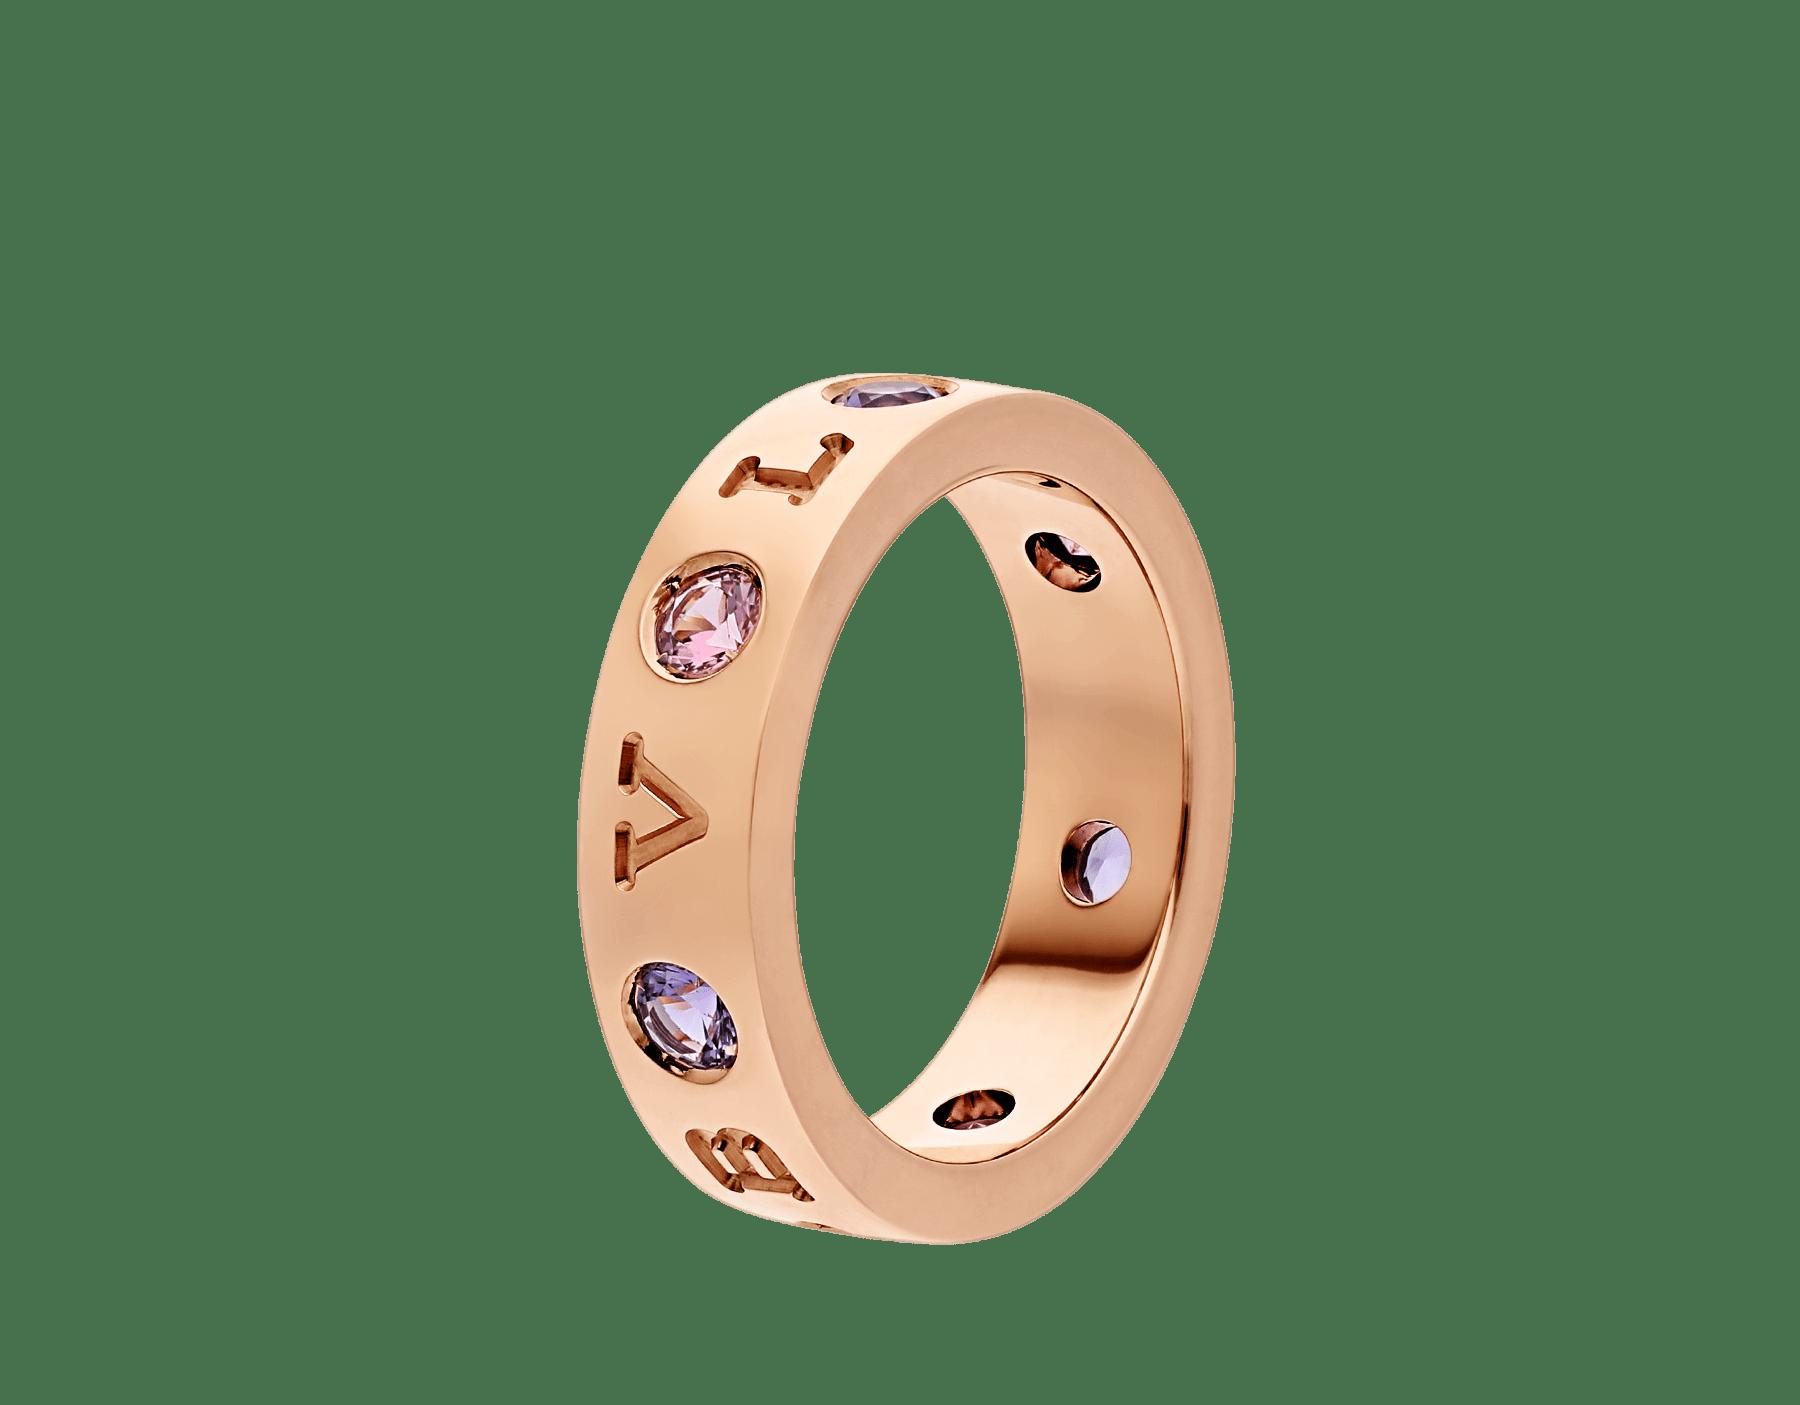 BVLGARI BVLGARI 18 kt rose gold ring set with amethysts and pink tourmalines AN857669 image 1